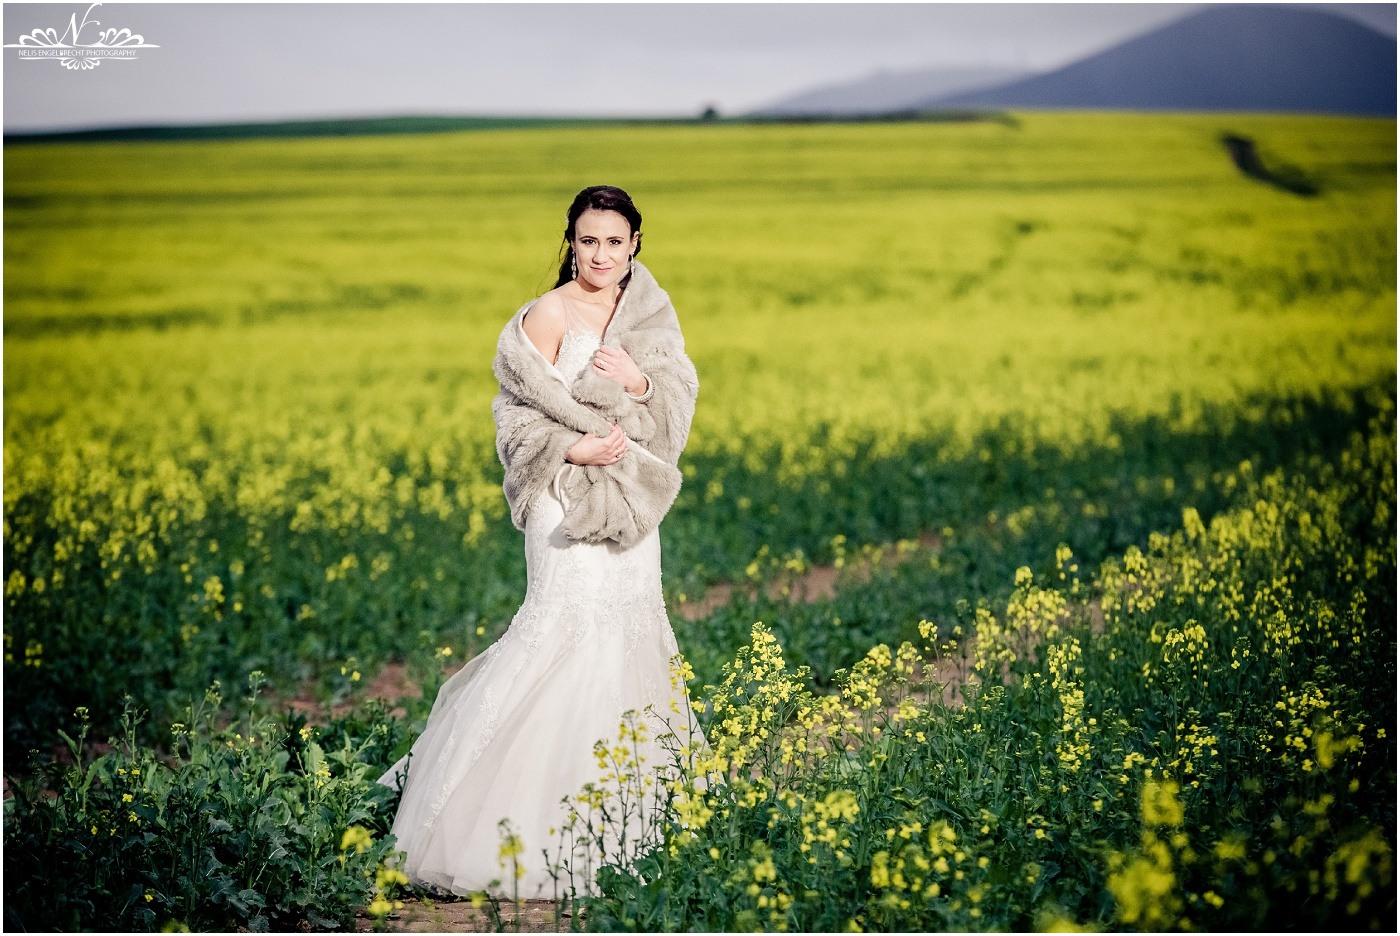 Eensgezind-Wedding-Photos-Nelis-Engelbrecht-Photography-149